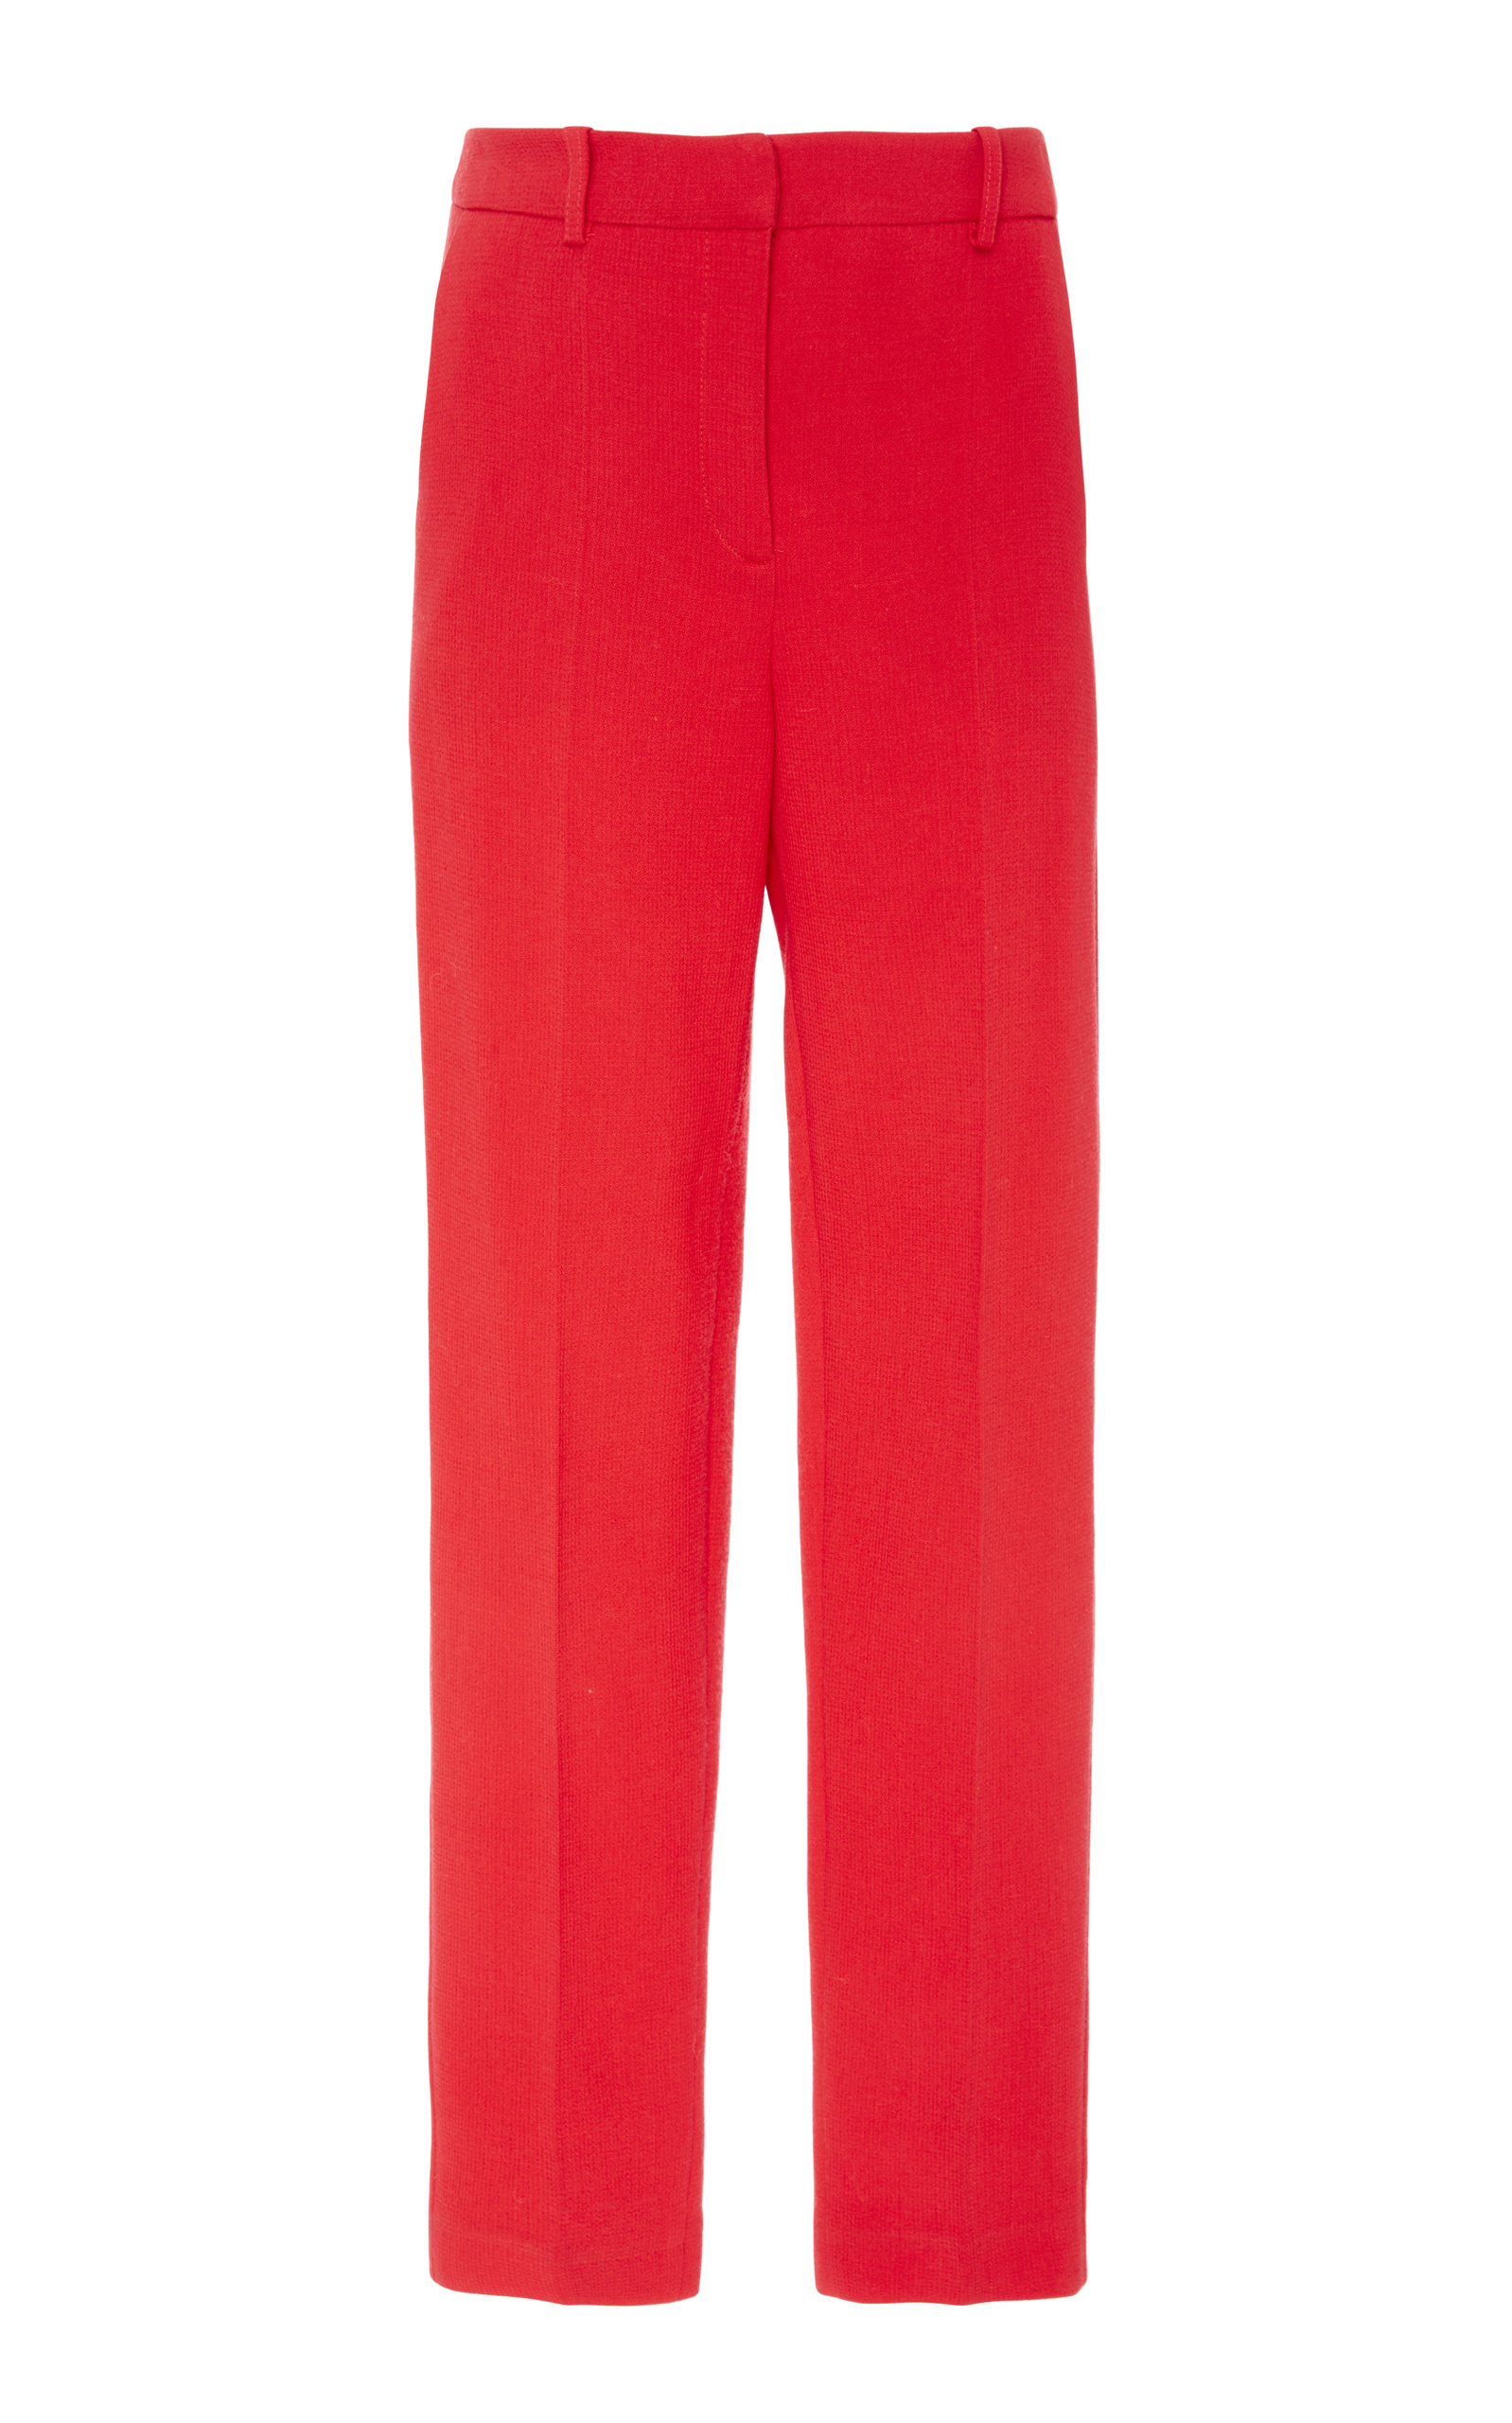 ALENA AKHMADULLINA Wool Trouser in Red